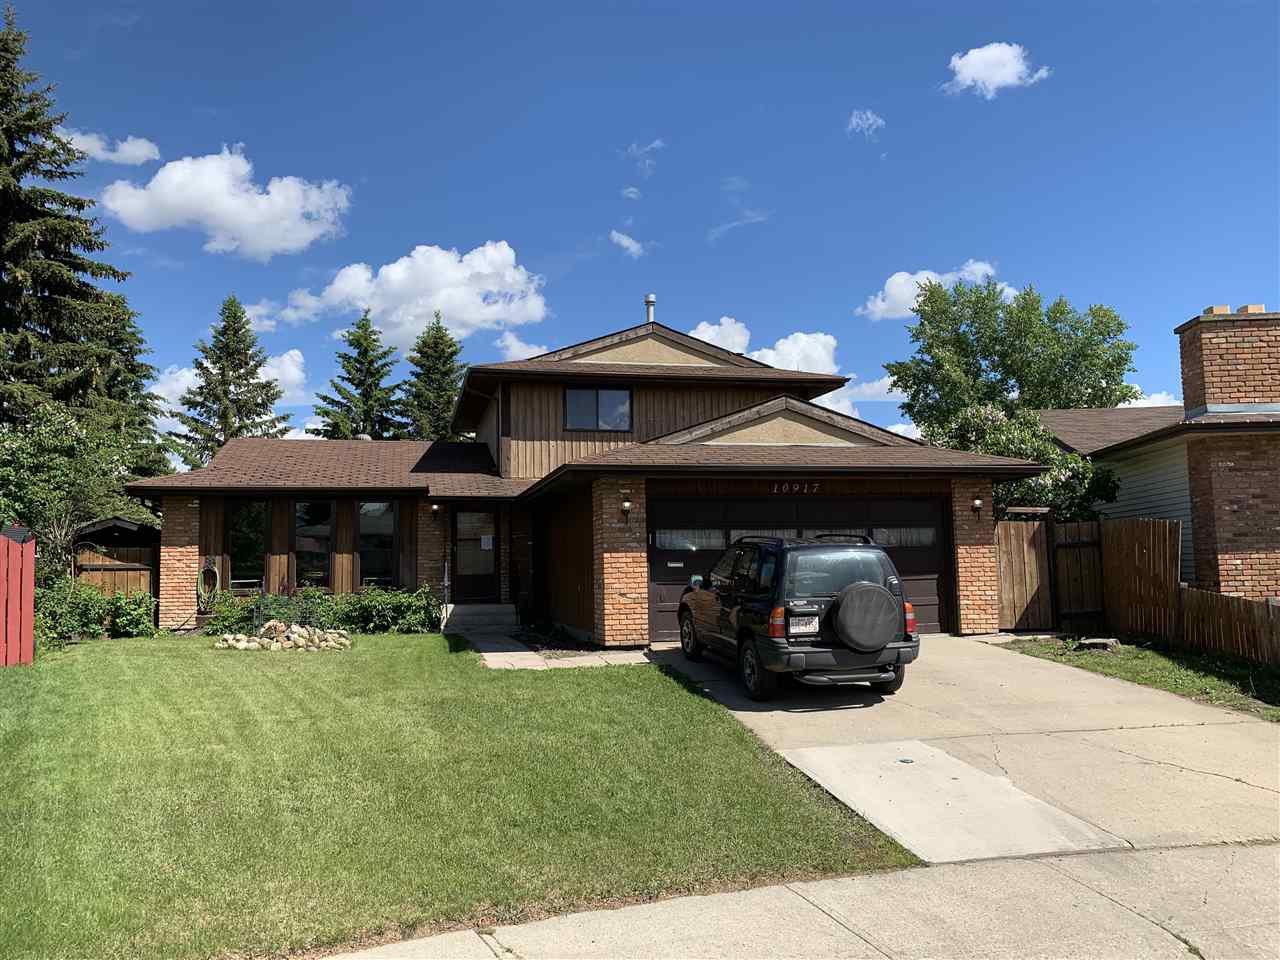 Main Photo: 10917 167A Avenue in Edmonton: Zone 27 House for sale : MLS®# E4161586